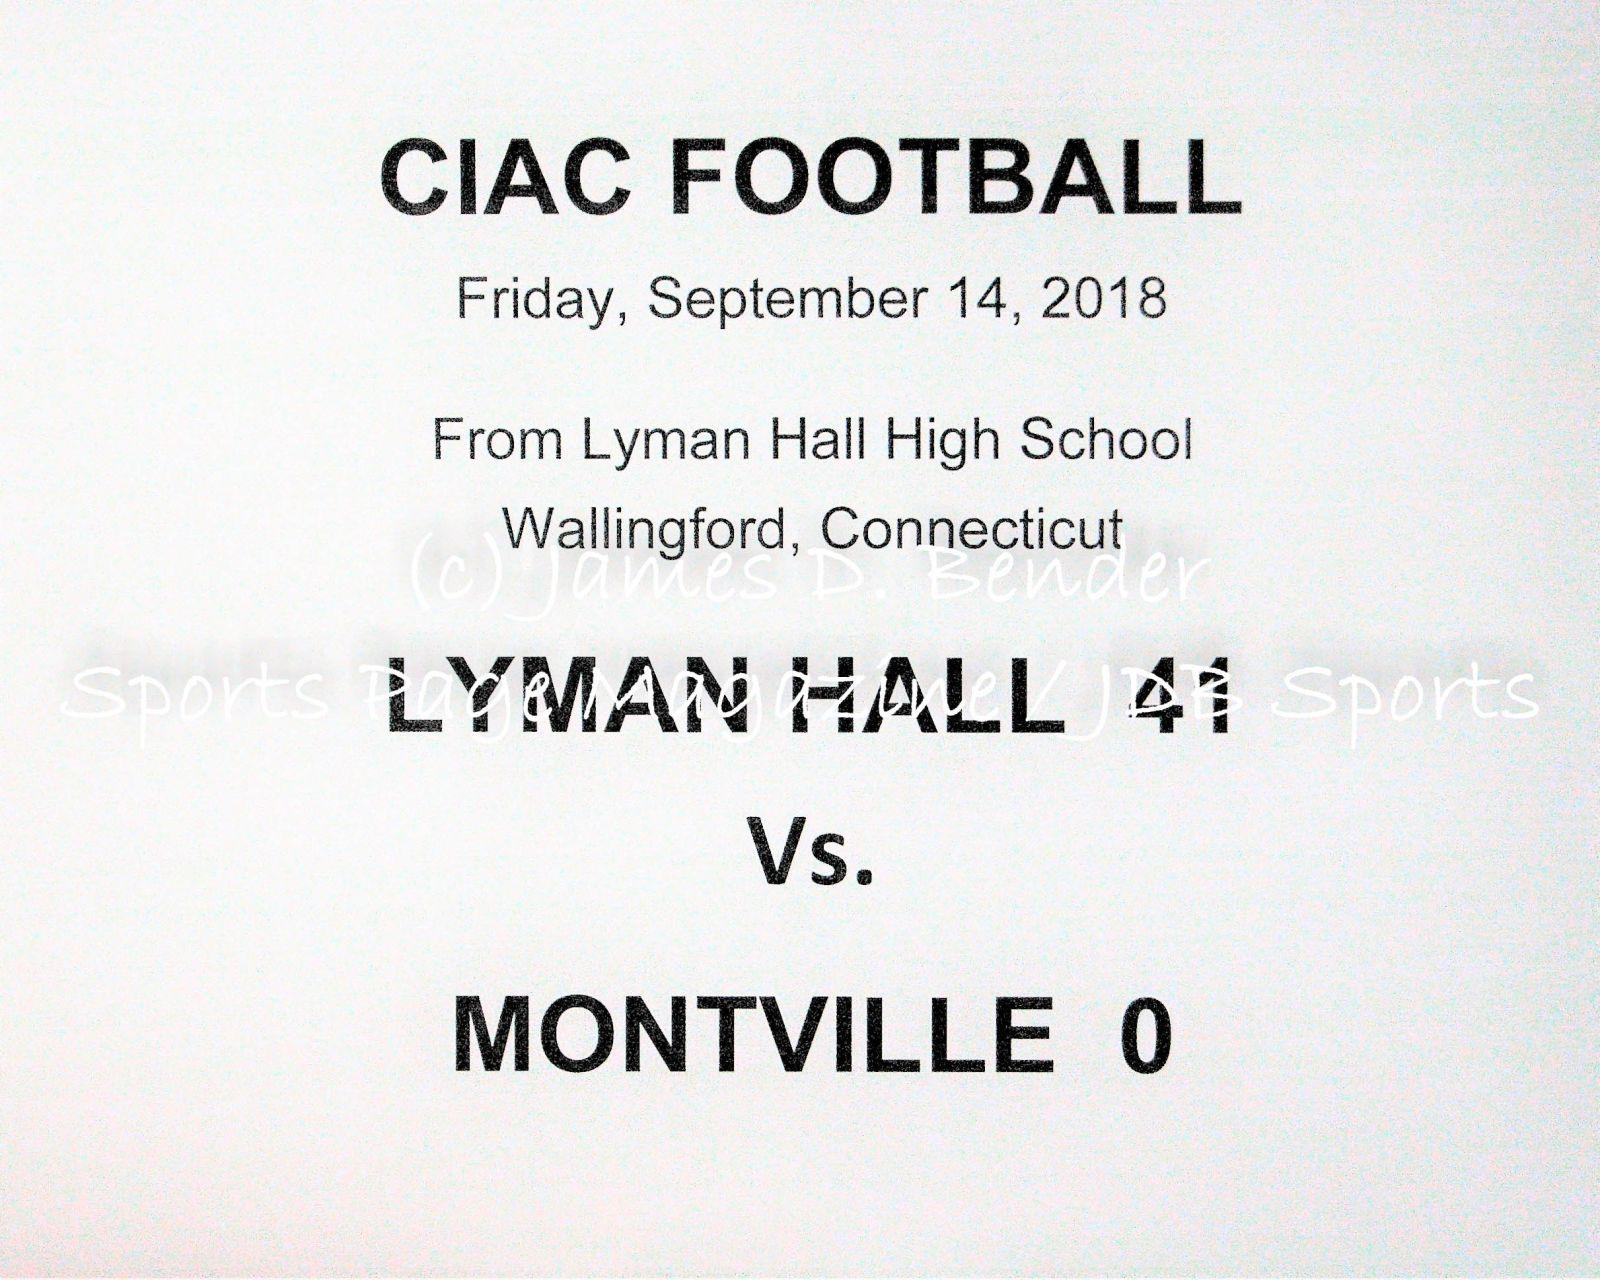 Gallery CIAC Football: Lyman Hall 41 vs  Montville 0